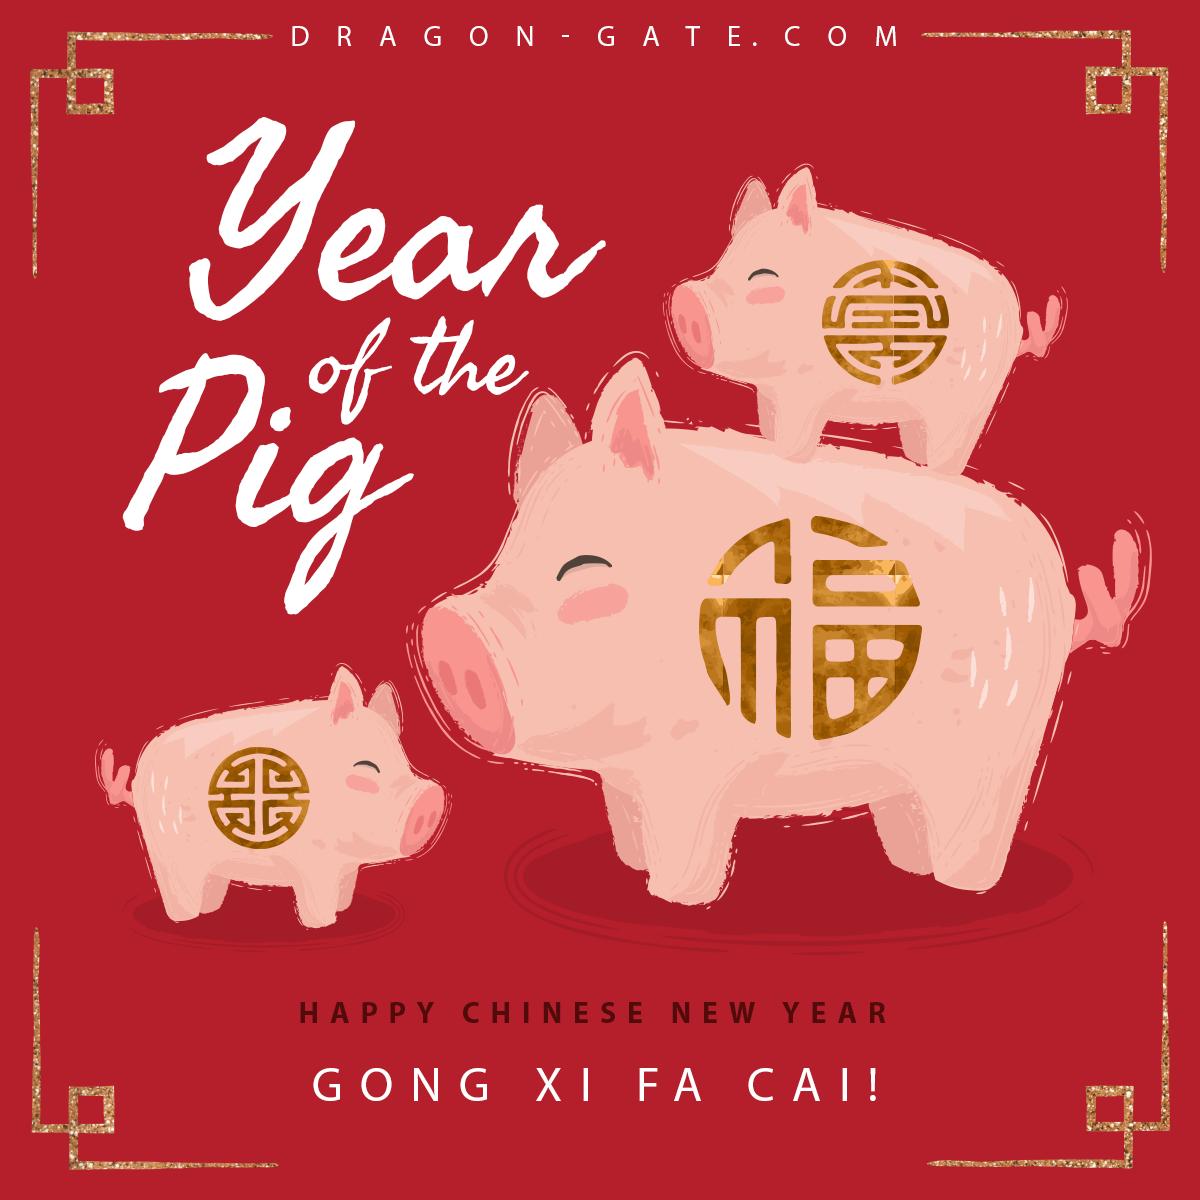 Happy Chinese New Year @BlaineRincon @JaysonWSmith @ANNIEMOHO @xanderberkeley @JD6120 @josh_mikel @AngryWillard  @sweetstephen55 @wholelottacrzy @1SpencerGarrett @garretdillahunt @kirkacevedo @vibesbmx @MikeKonanec @HunterWatsonALA @RoeDigi @actorindie @MikeSeal77 @girlsgottaeat